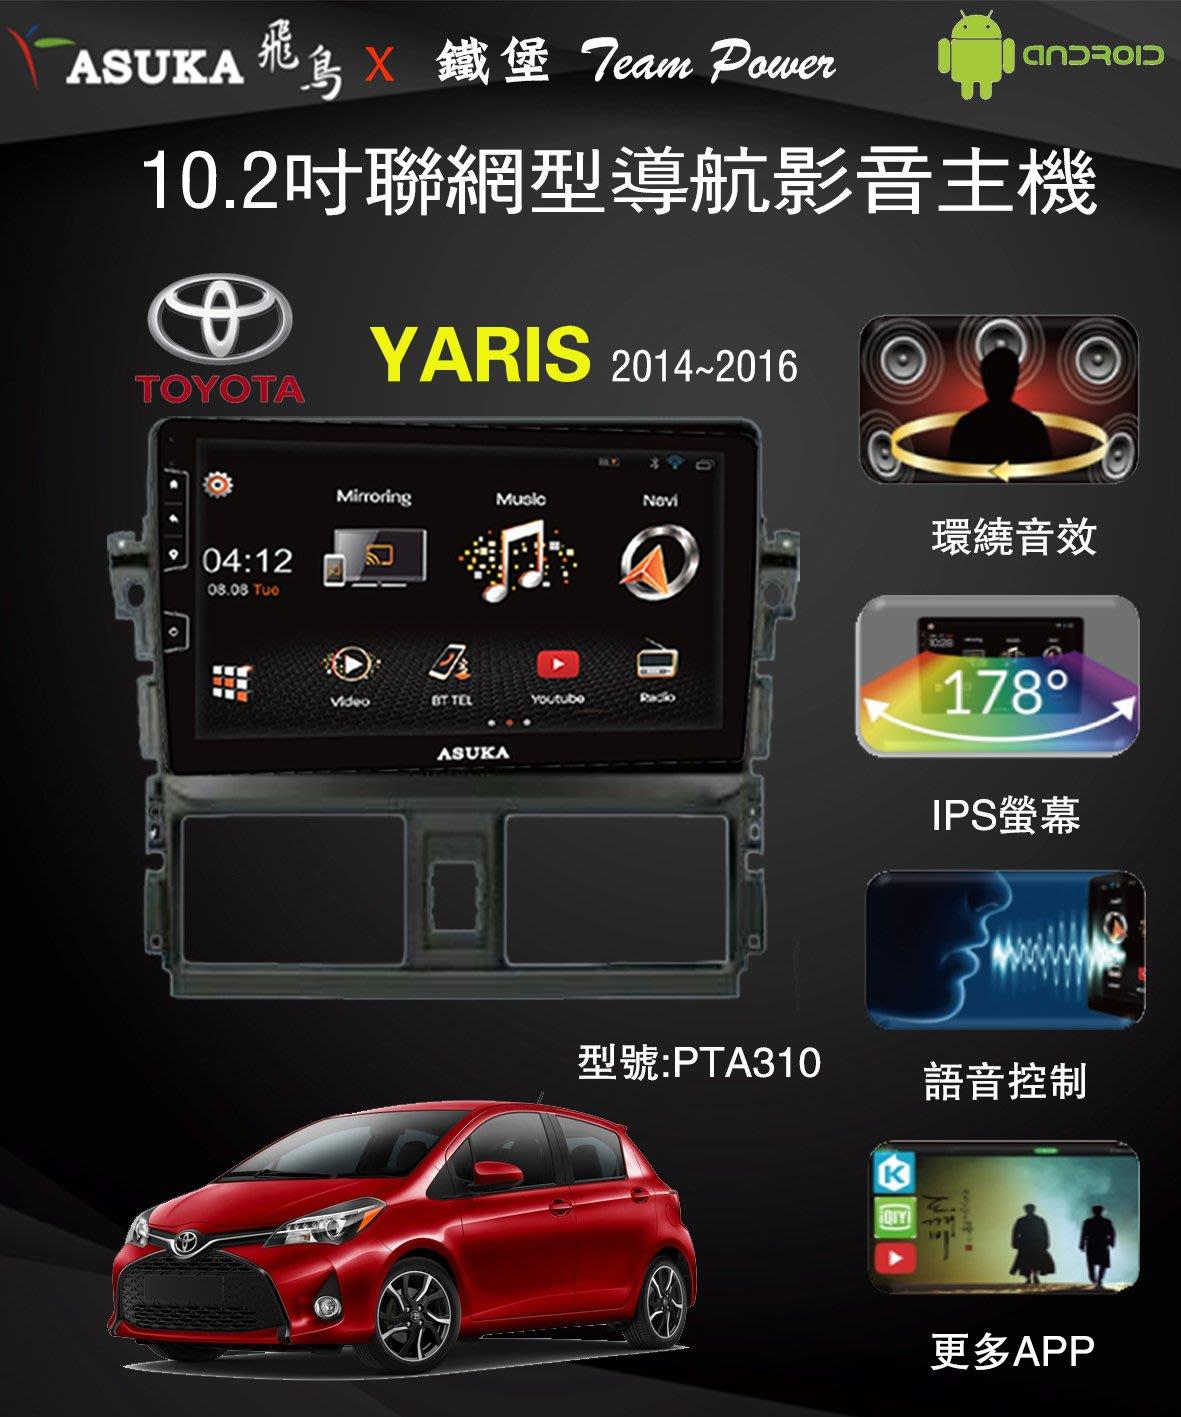 飛鳥PTA-310 安卓機(Toyota_yaris 2014~2016)